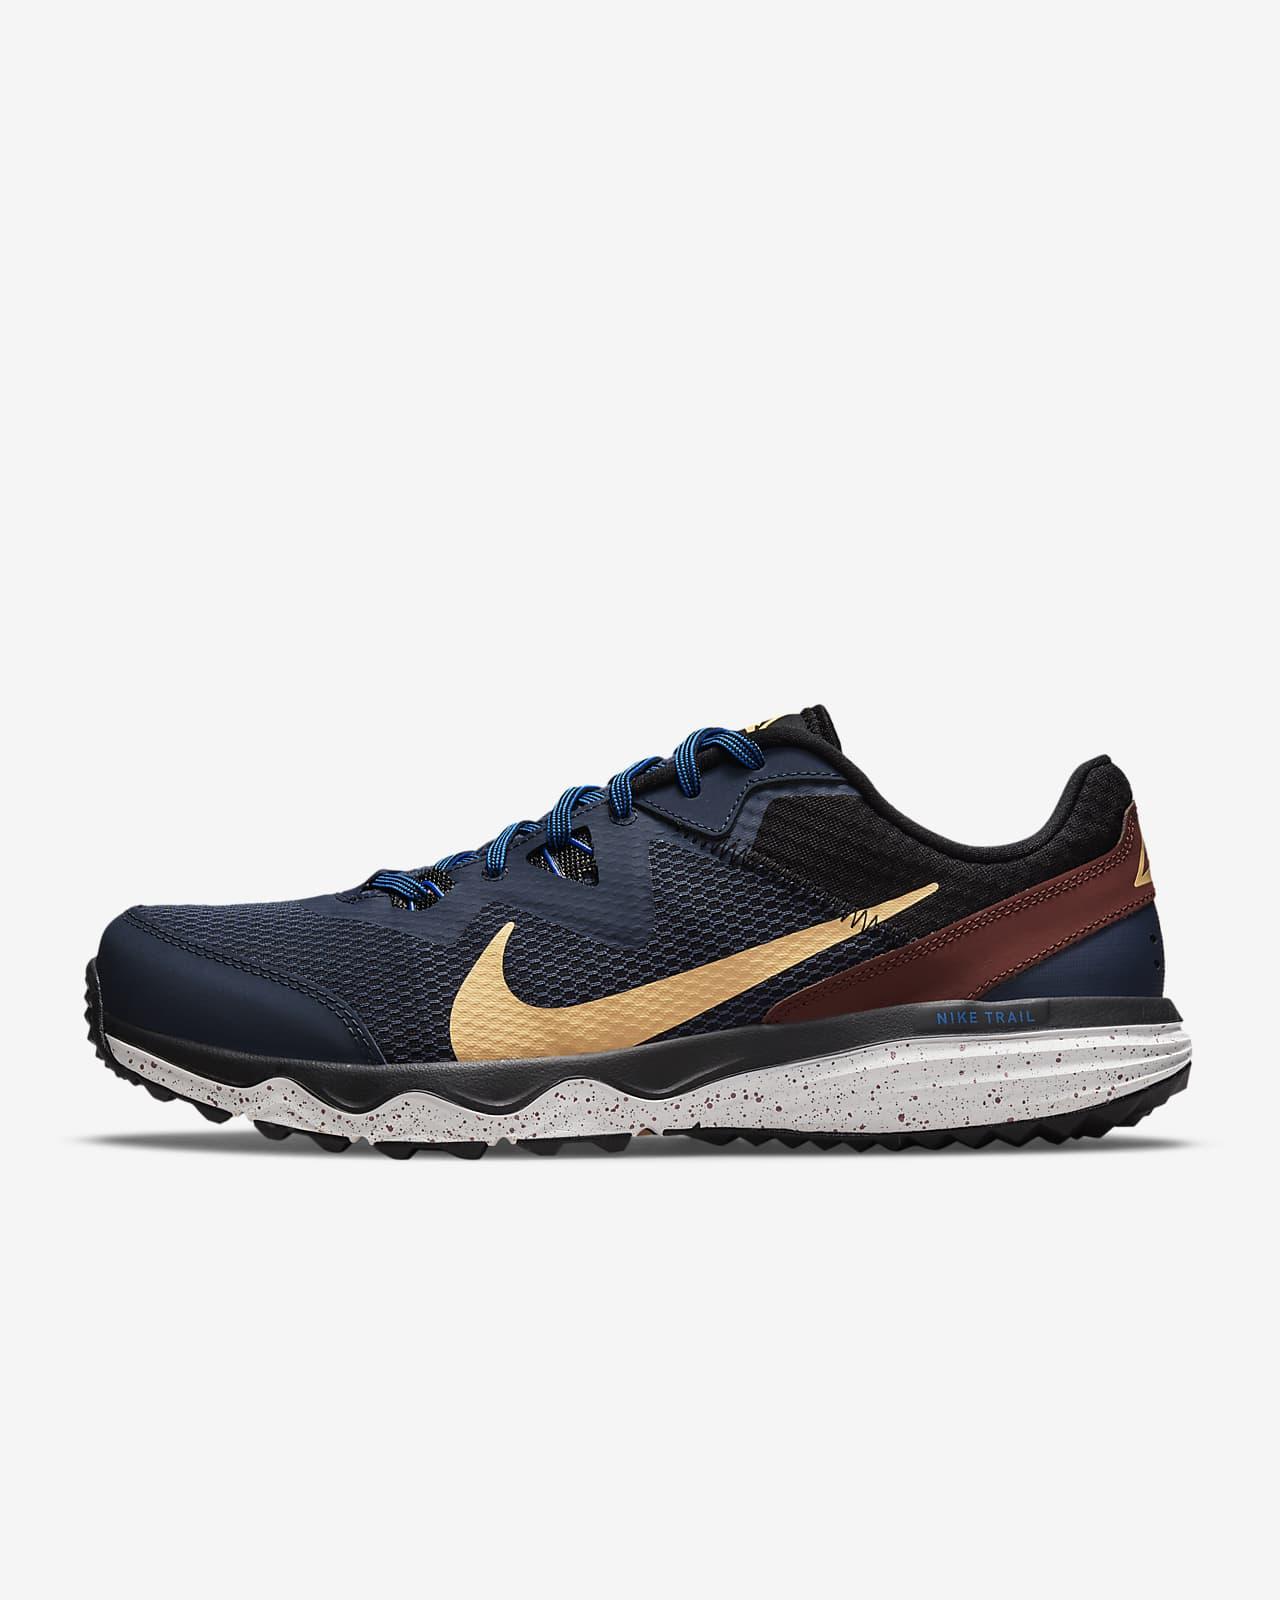 Nike Juniper Trail Men's Trail Running Shoes